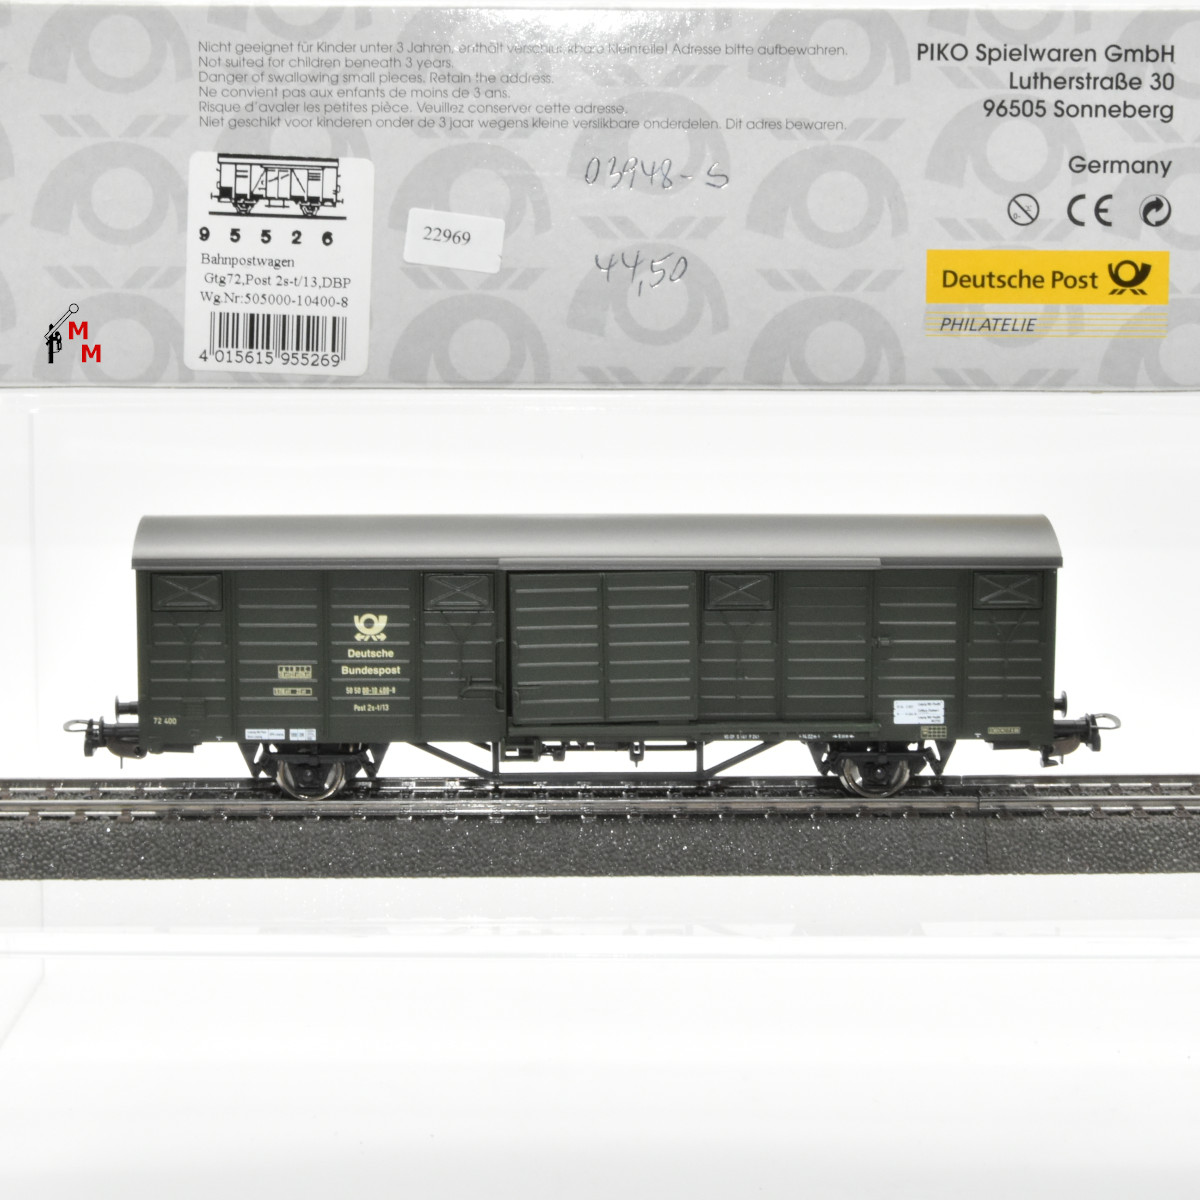 Piko 95526 Bahnpostwagen der DBP, (22969)